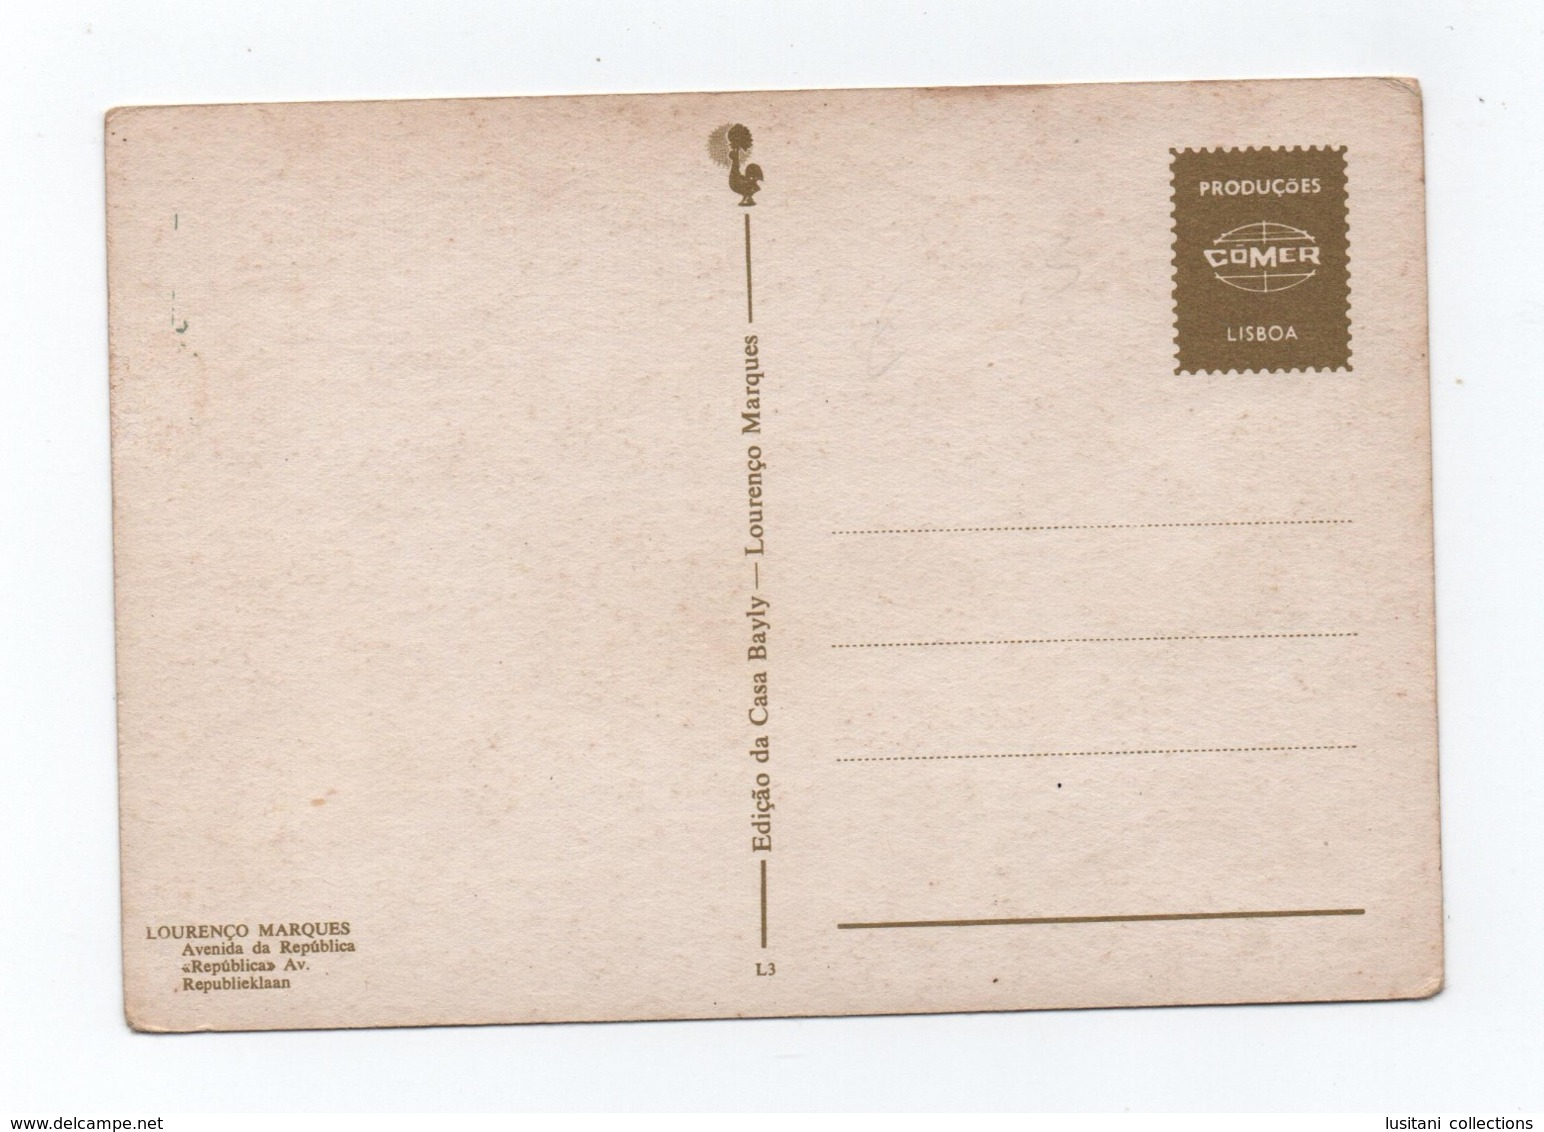 Postcard 1960years LOURENÇO MARQUES MOZAMBIQUE MOÇAMBIQUE AFRICA AFRIKA AFRIQUE - Mozambique